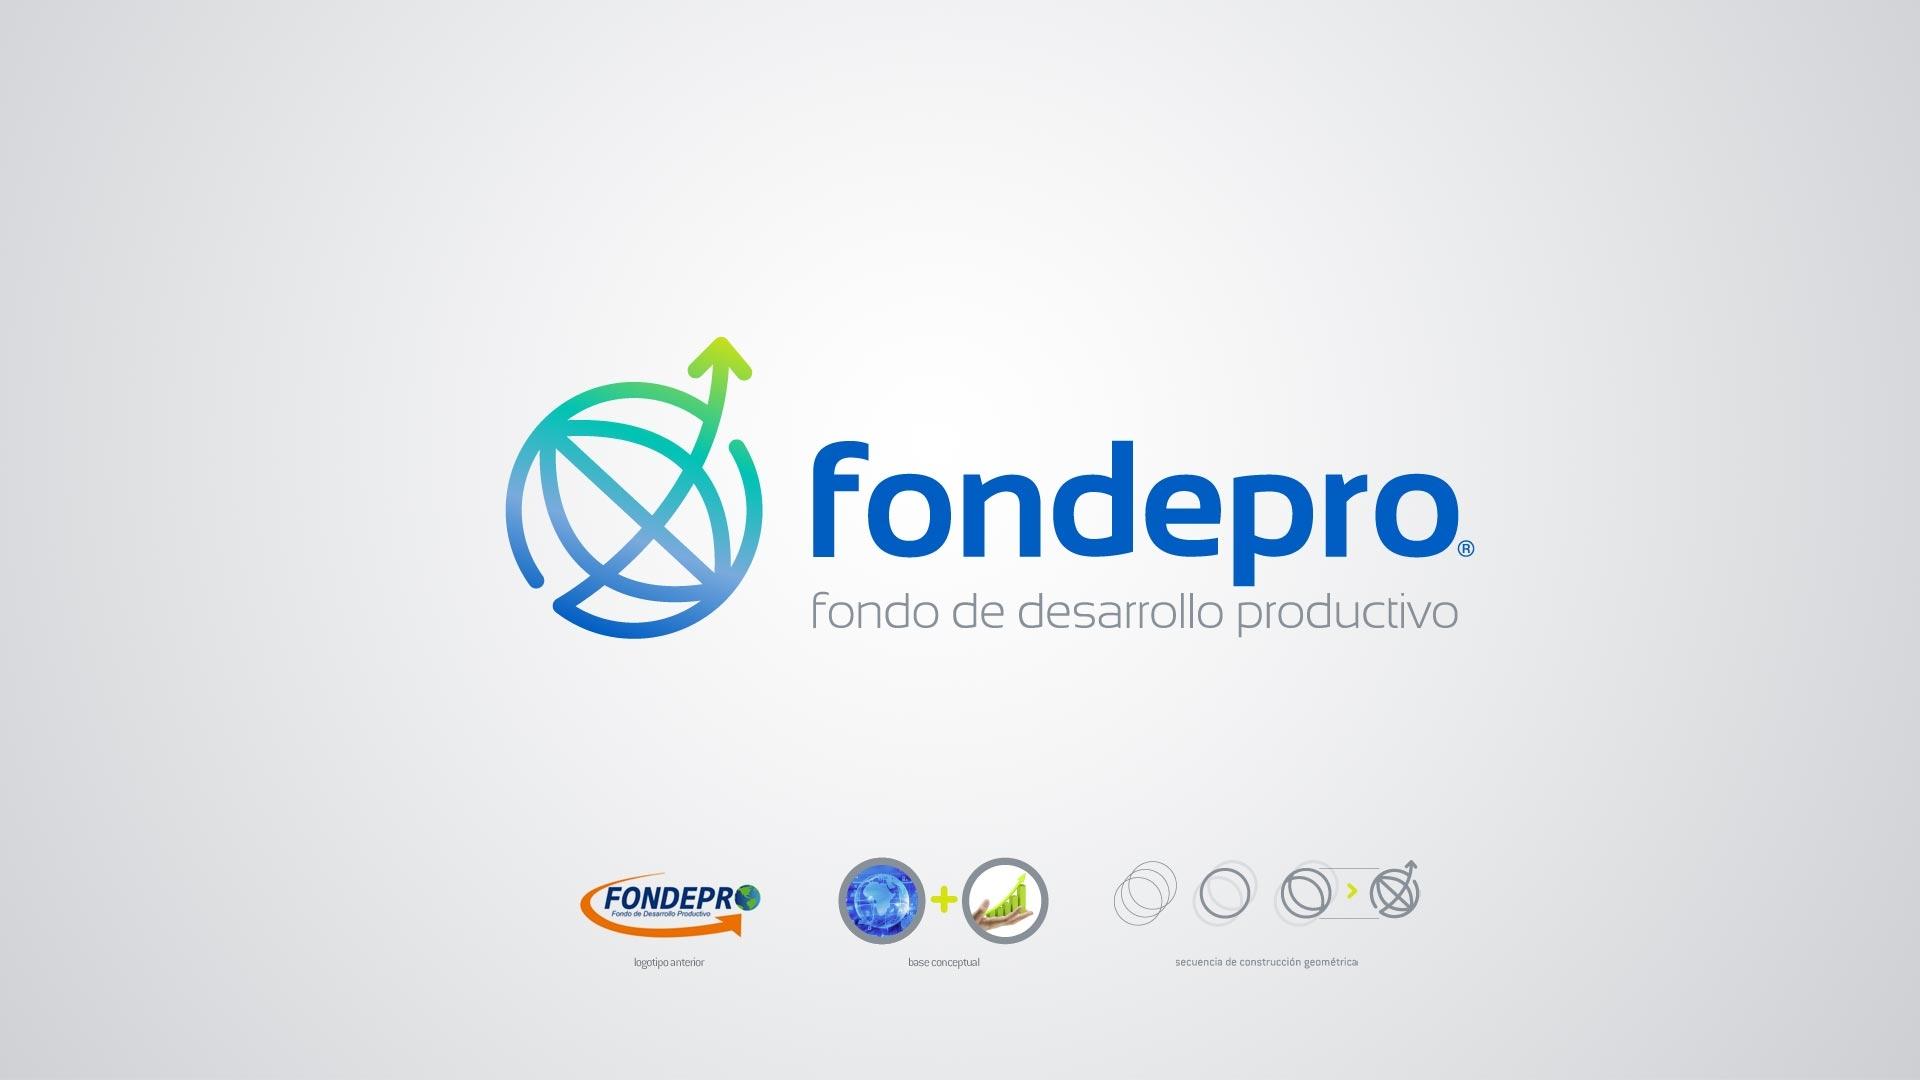 fondepro_logo1